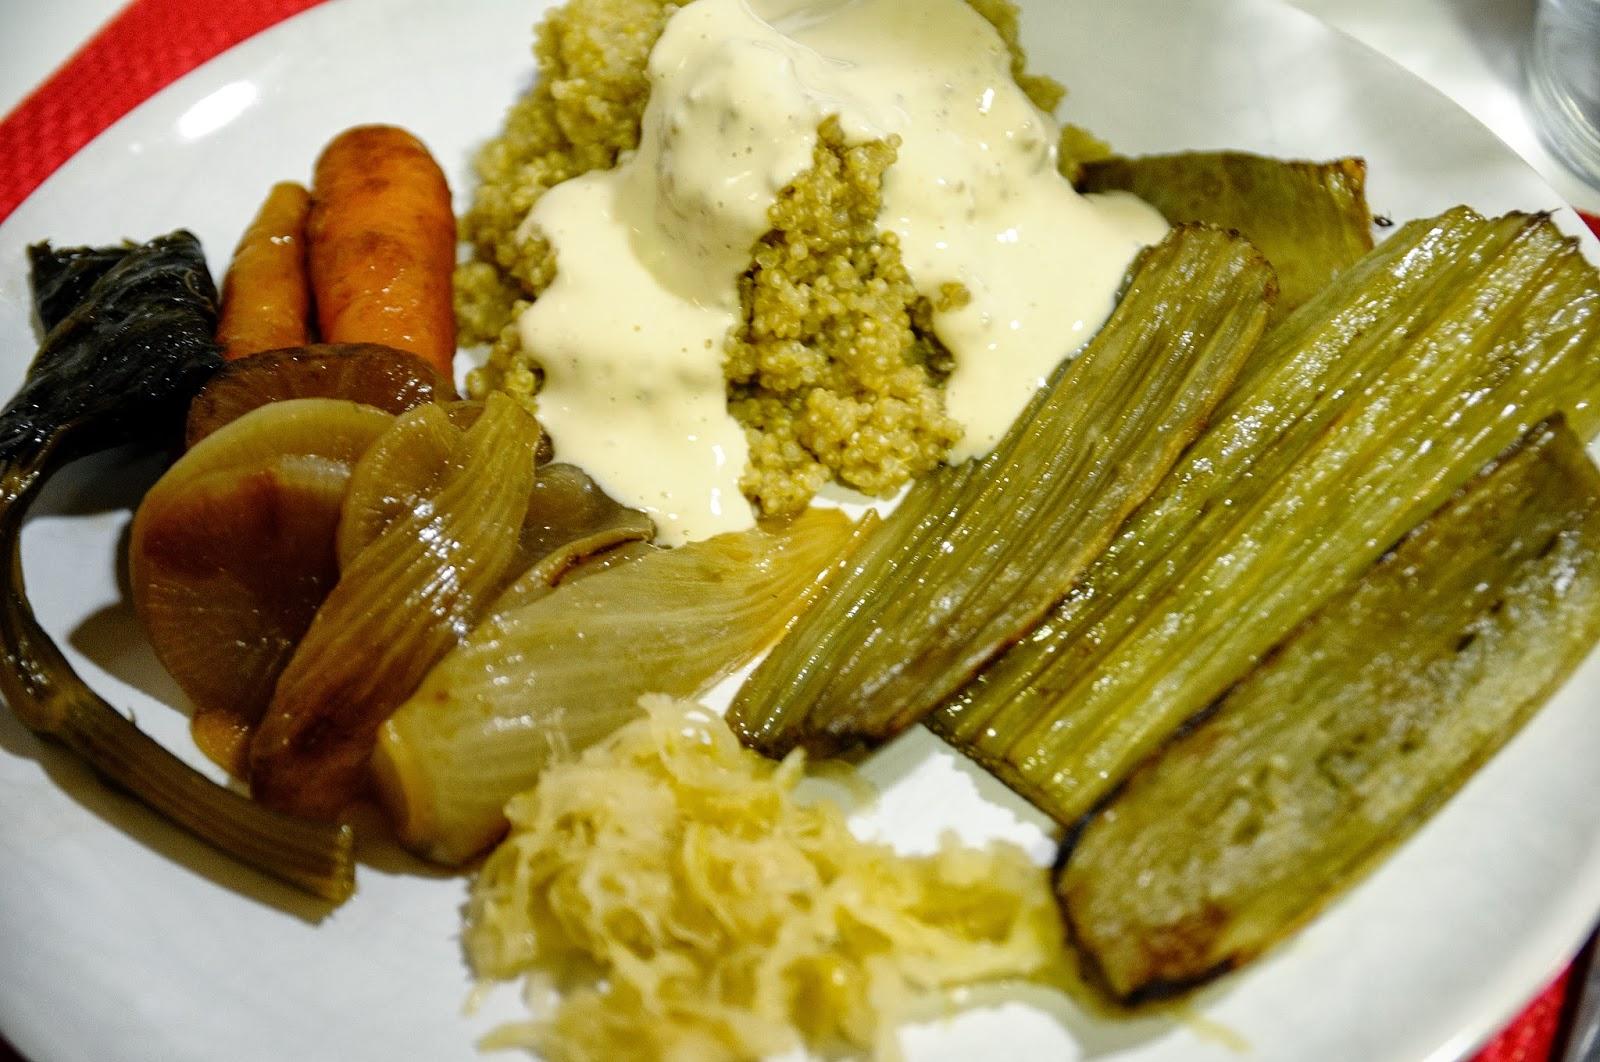 Estofado de verduras con quinoa y cardo gratinado cocinar para nutrir - Cocinar quinoa con verduras ...